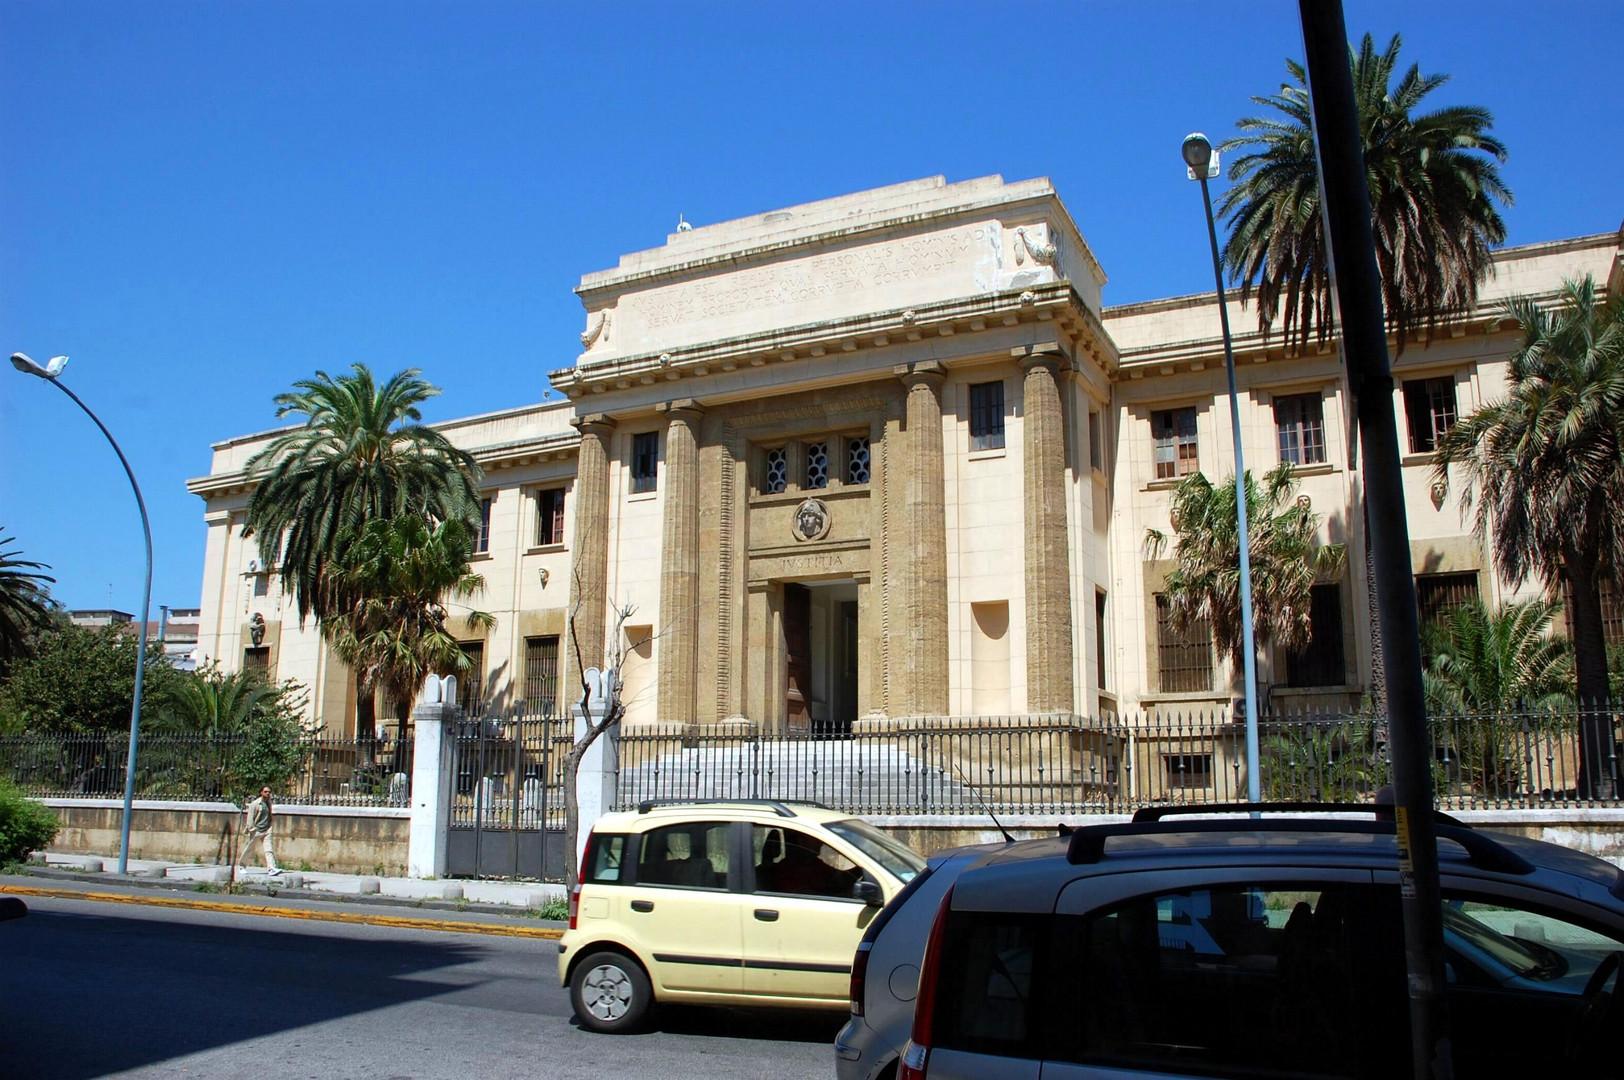 Justicgebäude in Messina